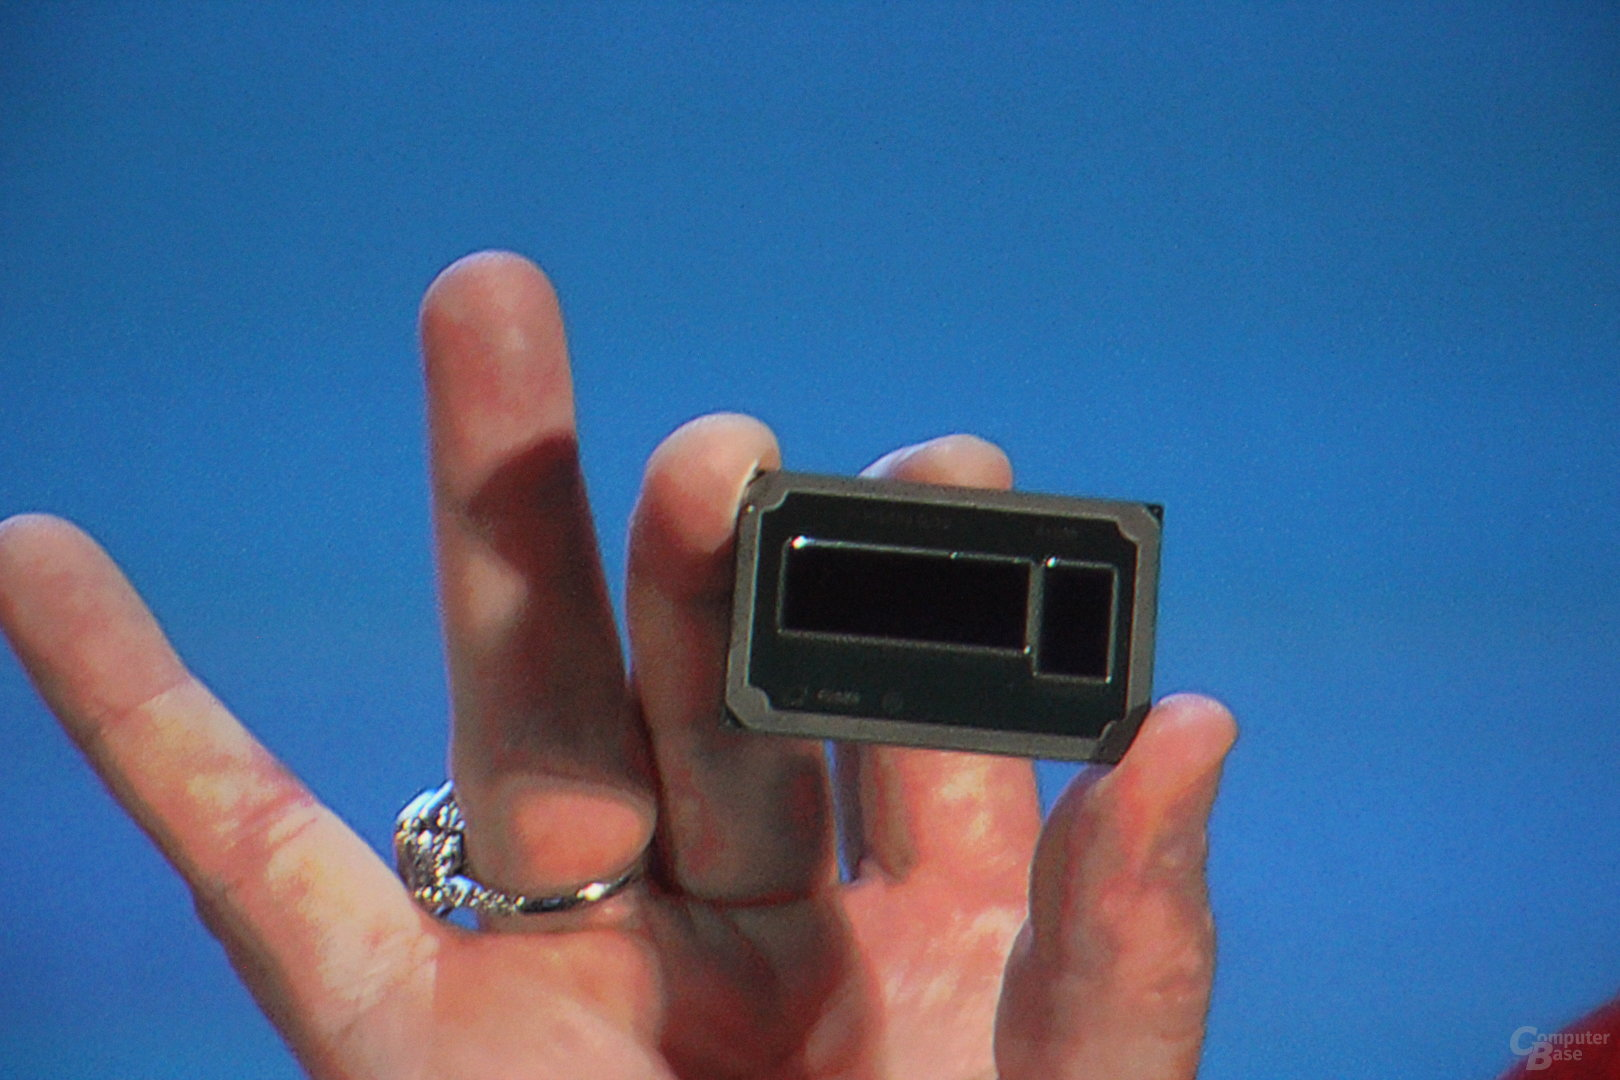 Intel Xeon E3-1500 v5